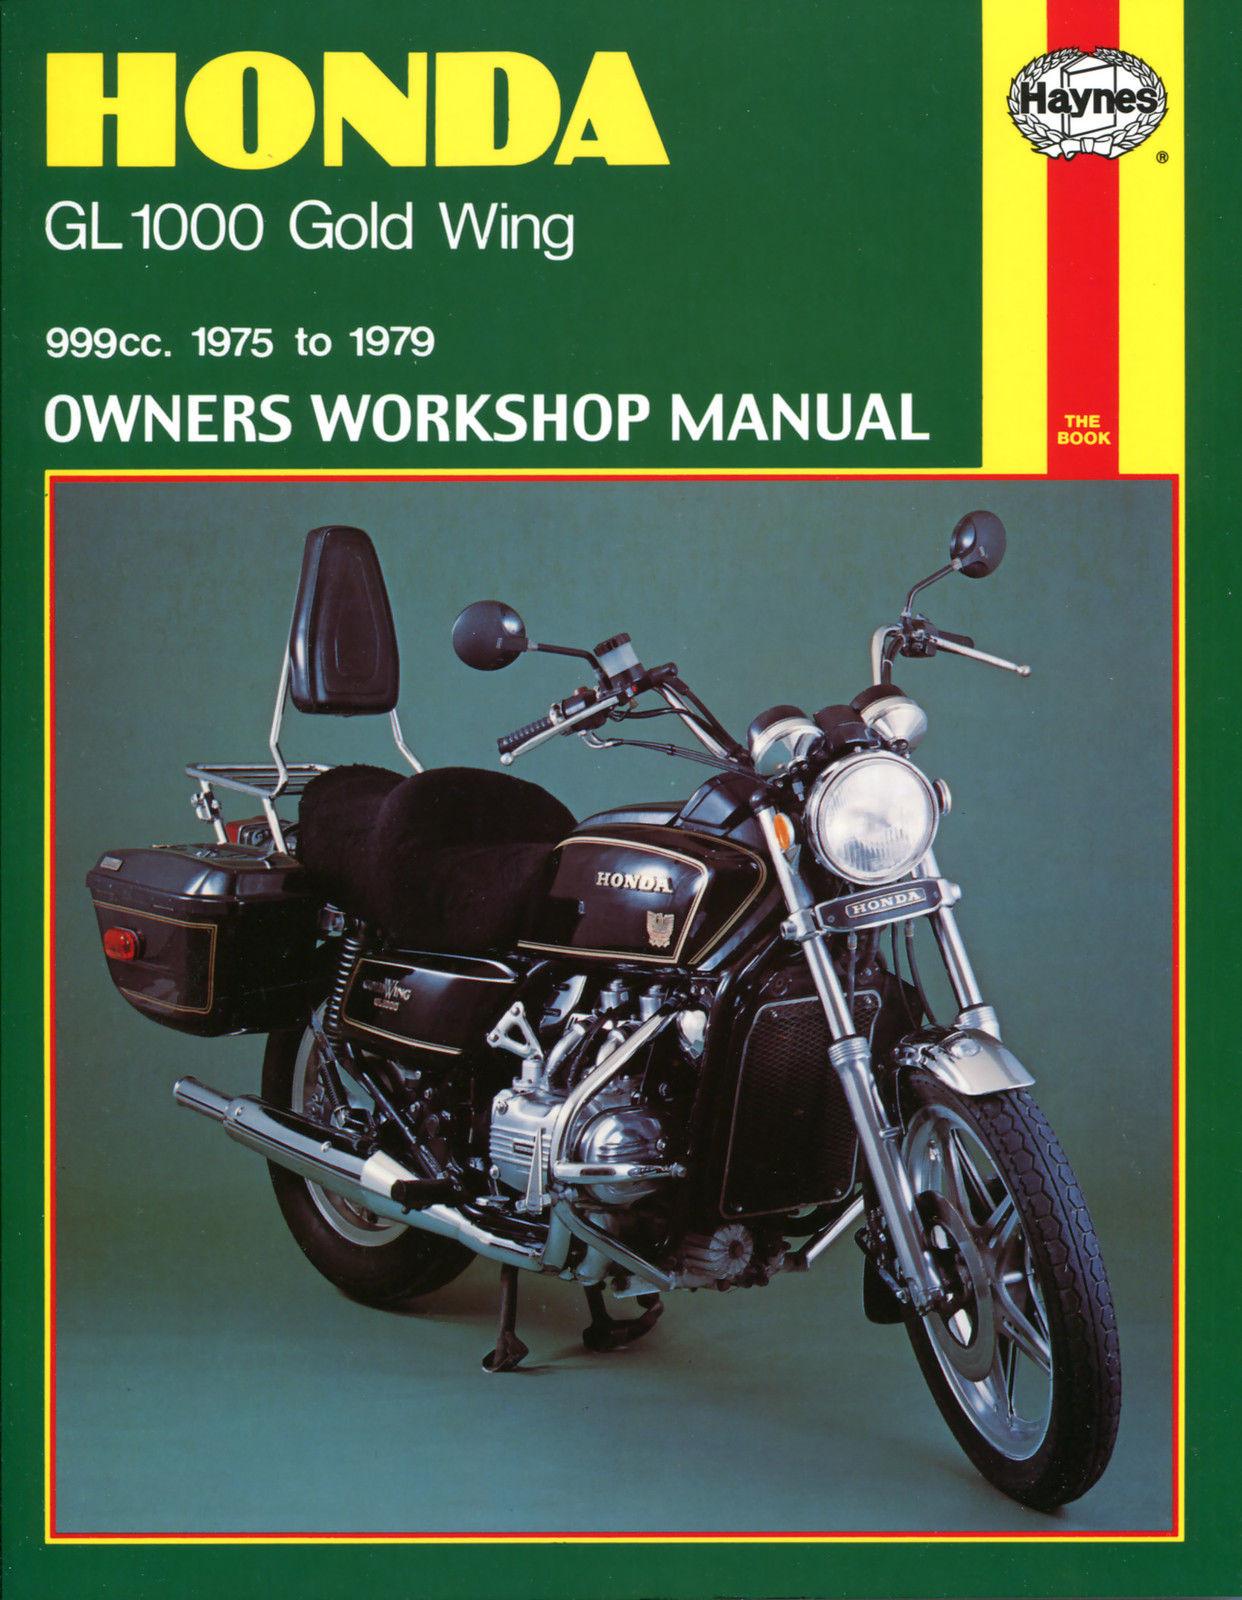 HAYNES MANUAL: HONDA GOLD WING GL1000 1976-1979